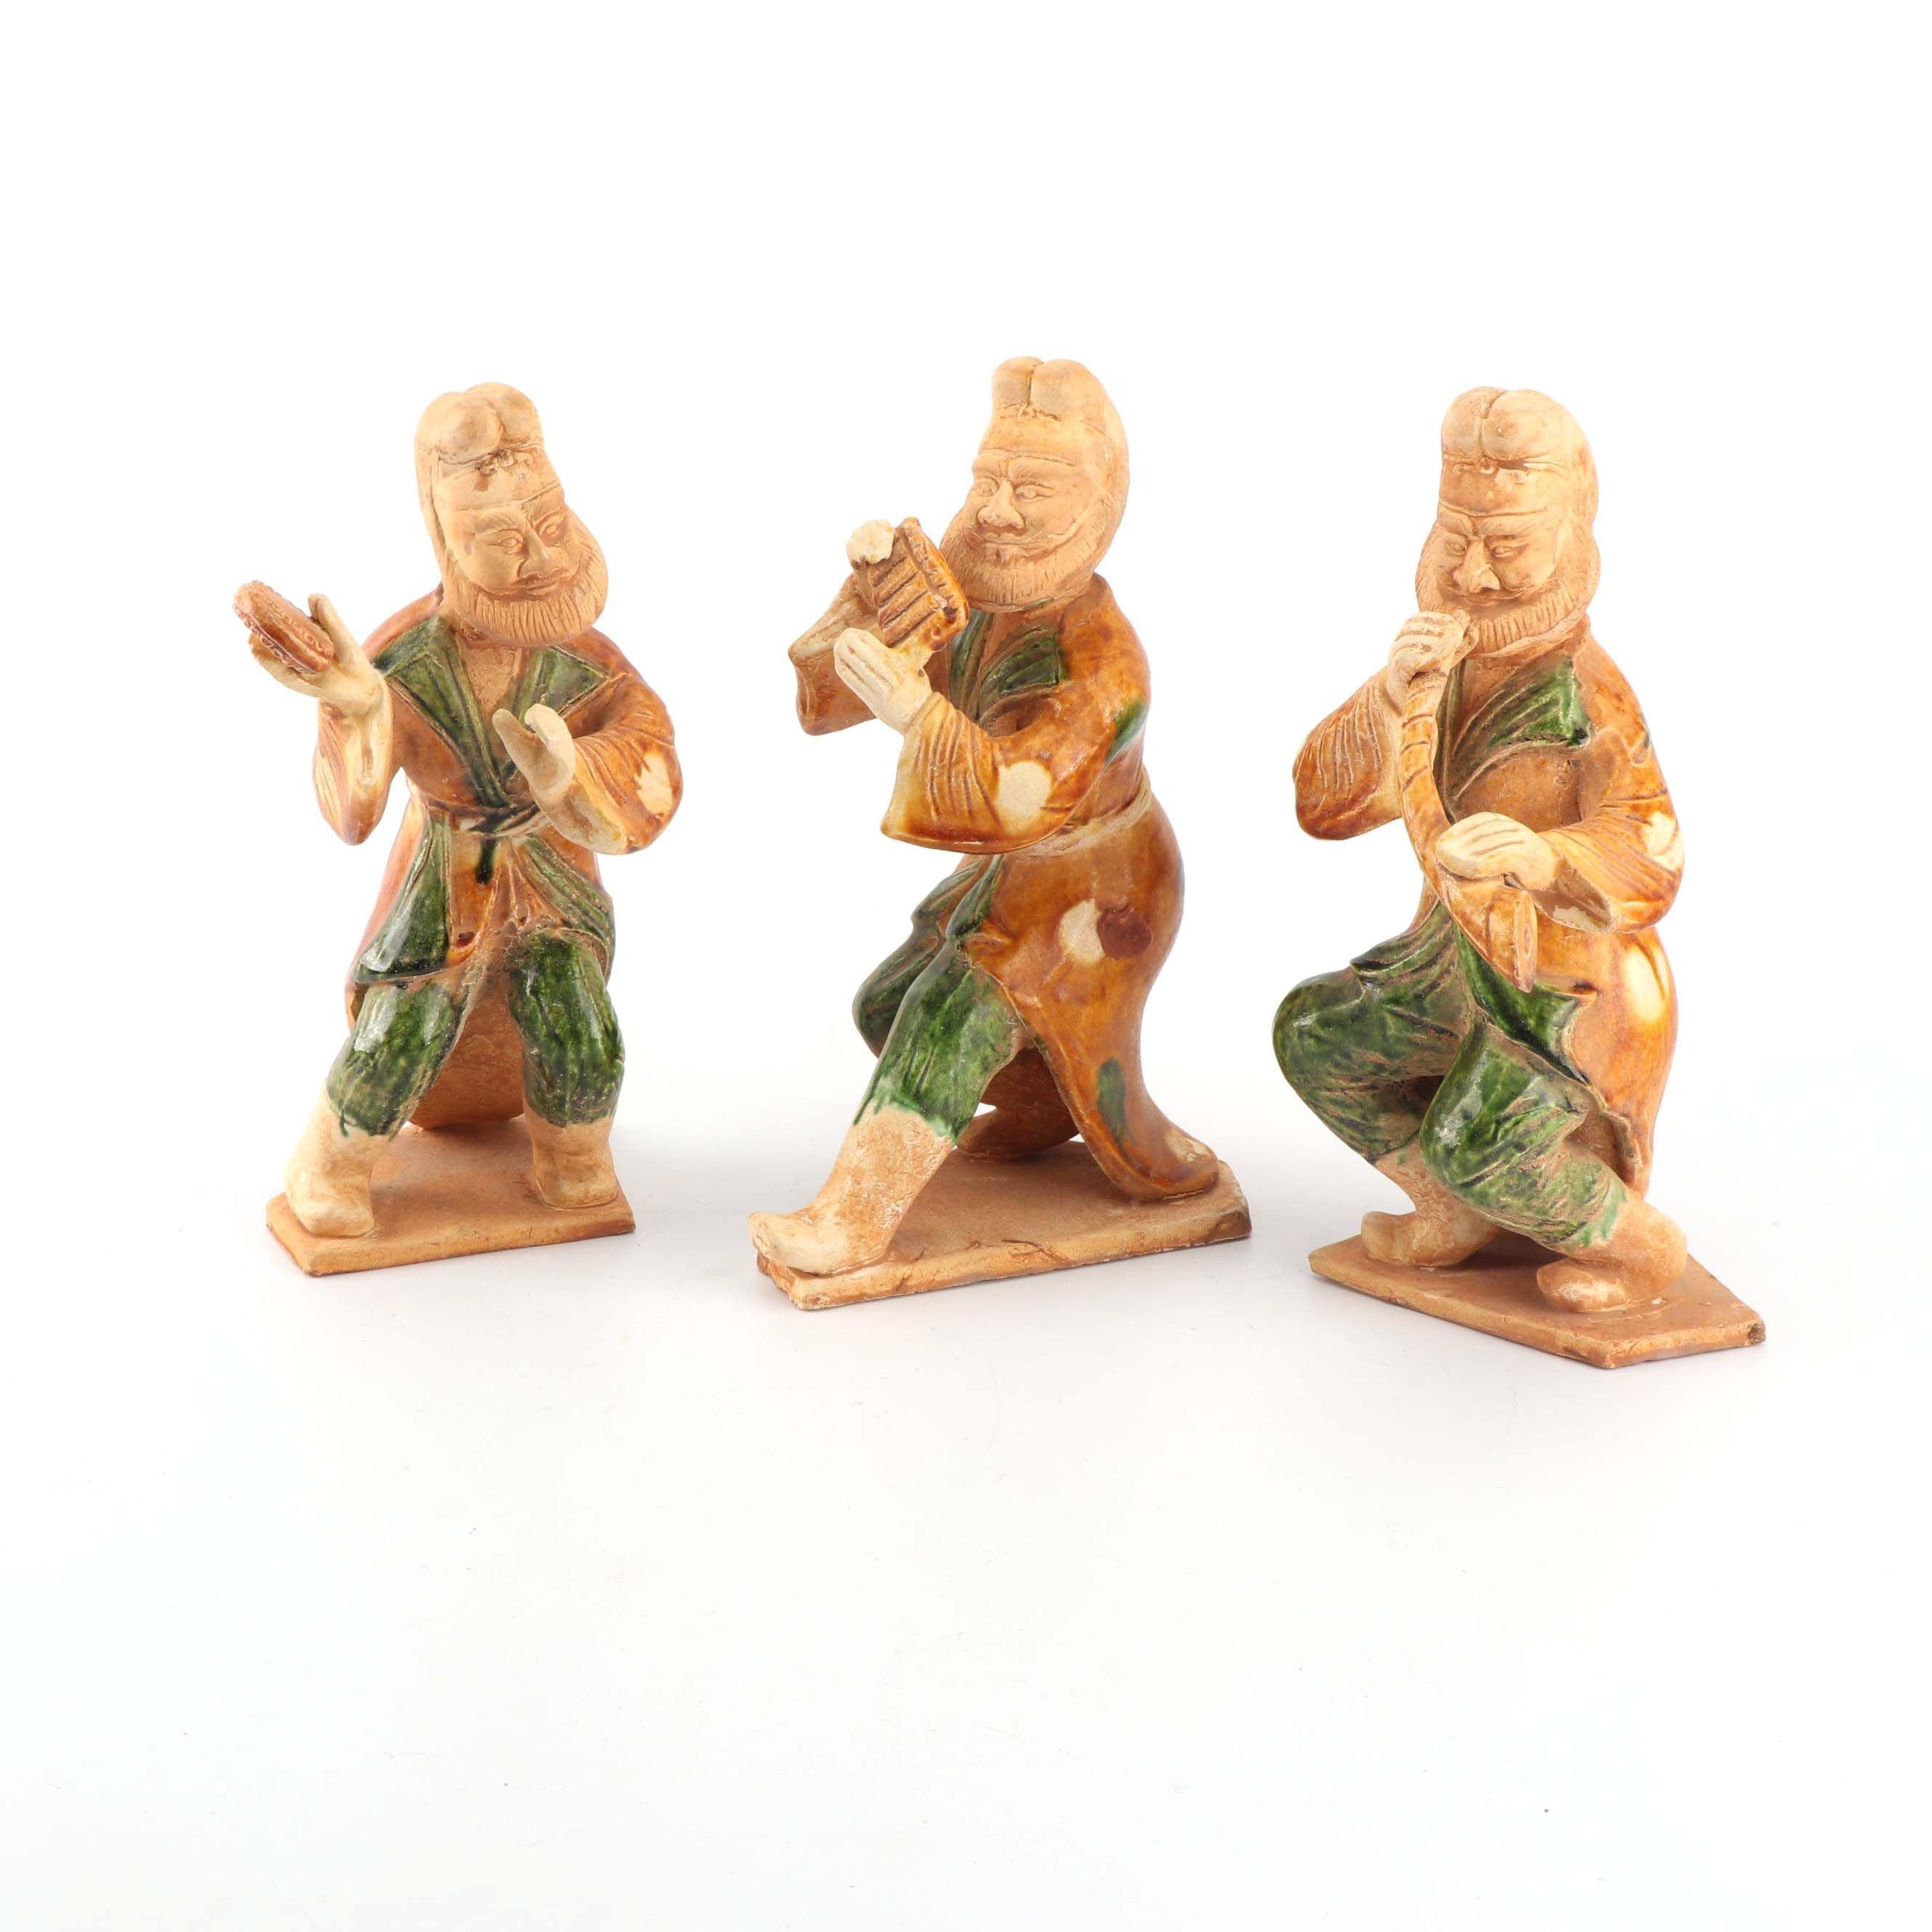 Chinese Tang Style Sancai Glazed Ceramic Musician Figurines